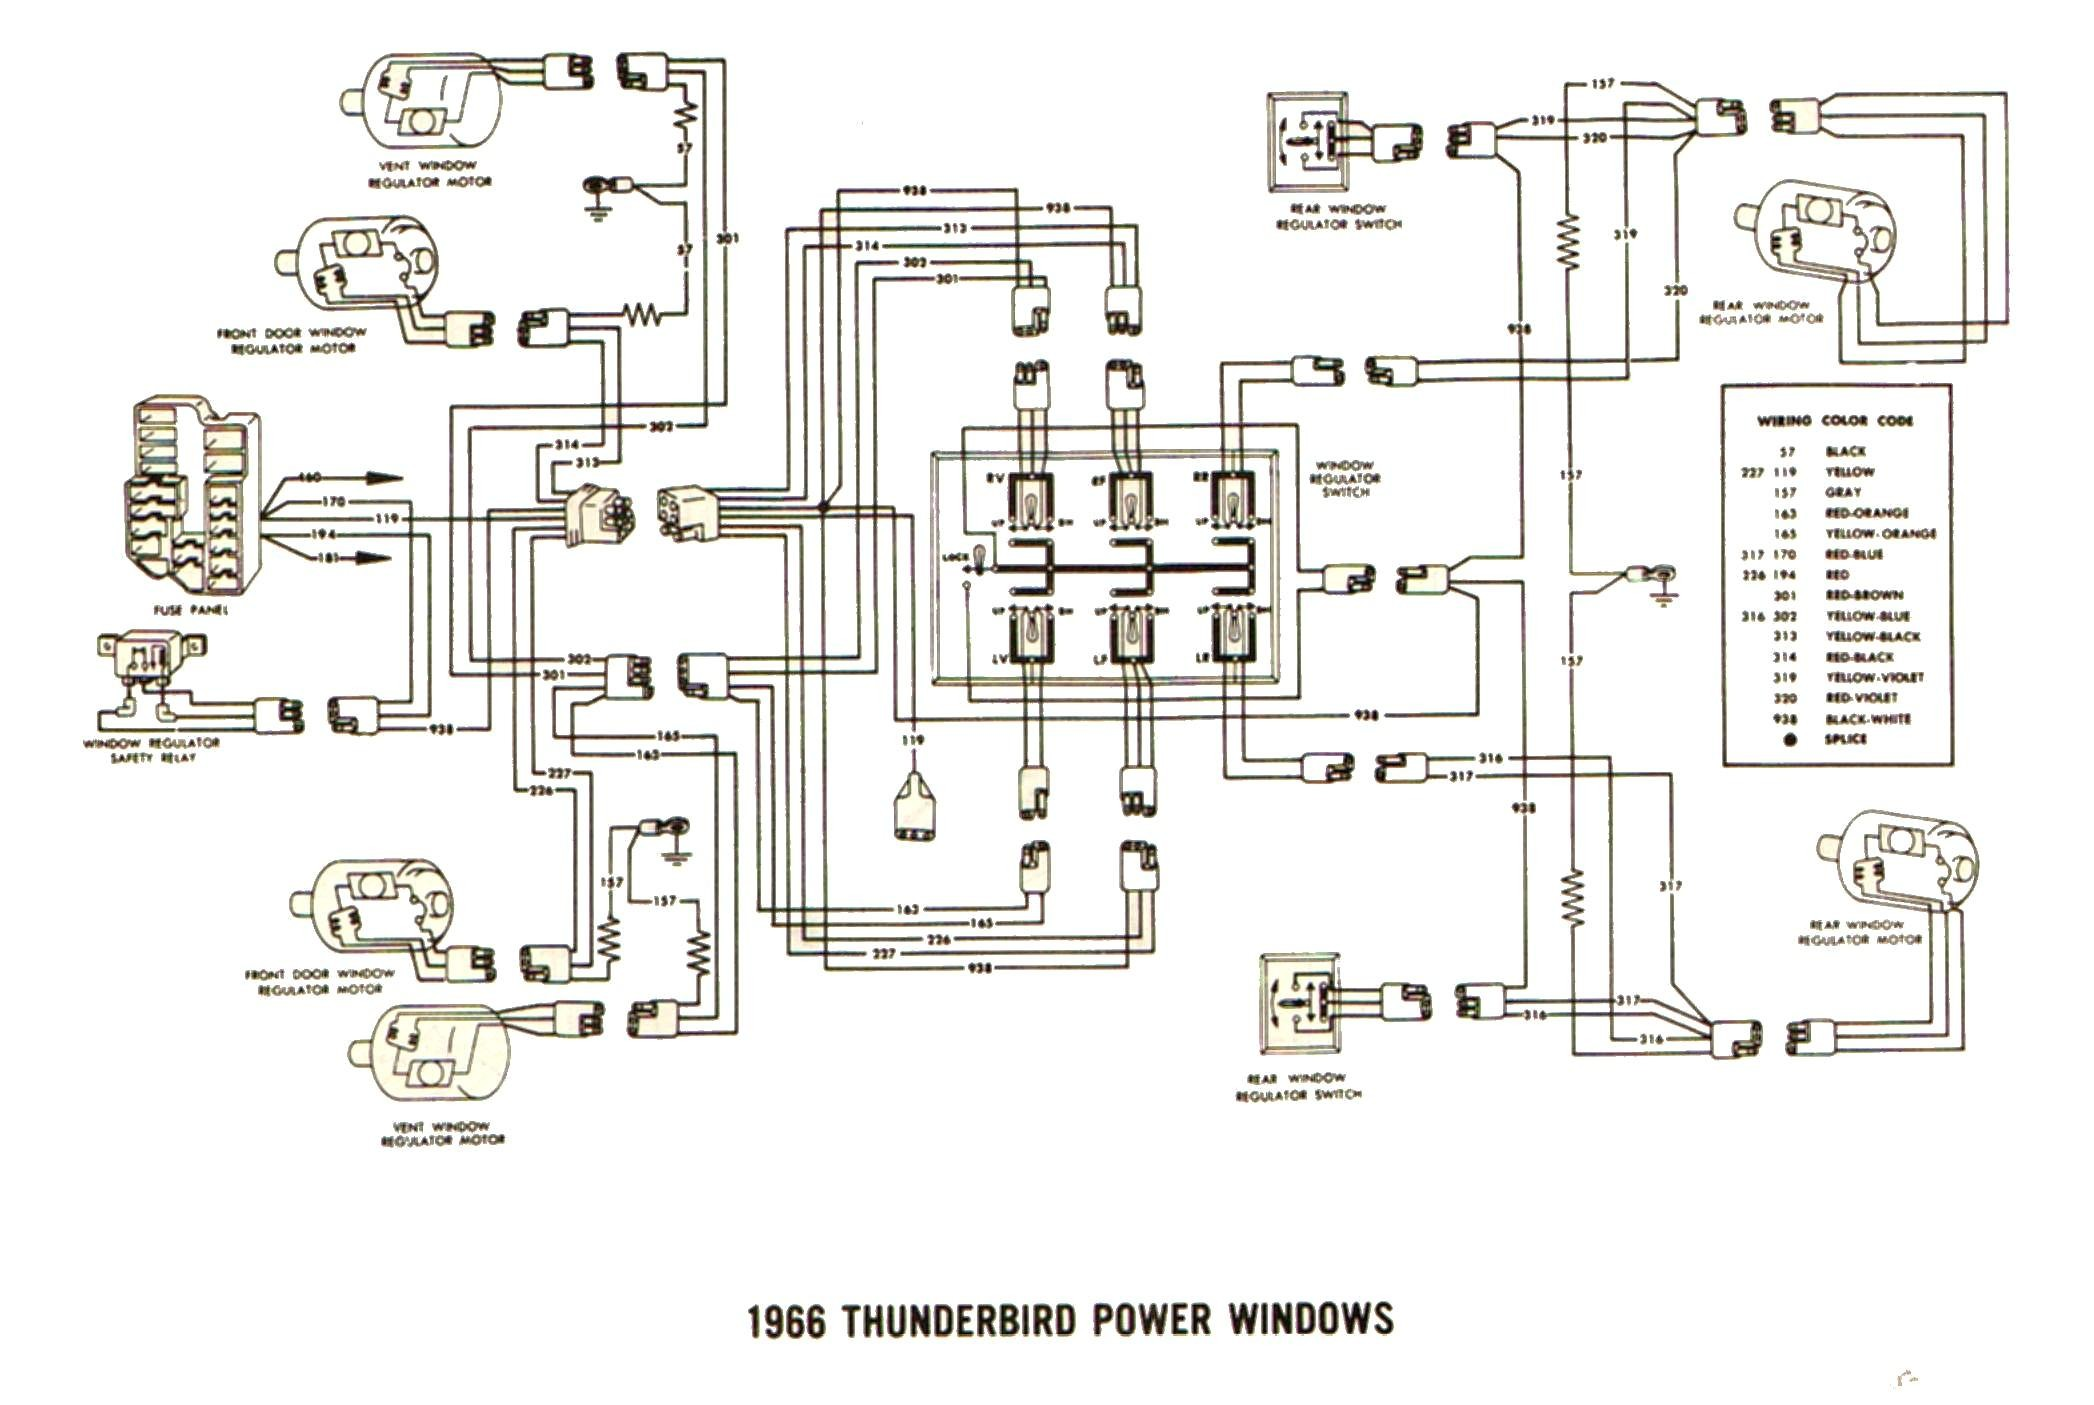 Wiring Diagram For Mf 180 Wiring Diagram For 2004 Alero Jeep Wrangler Losdol2 Jeanjaures37 Fr